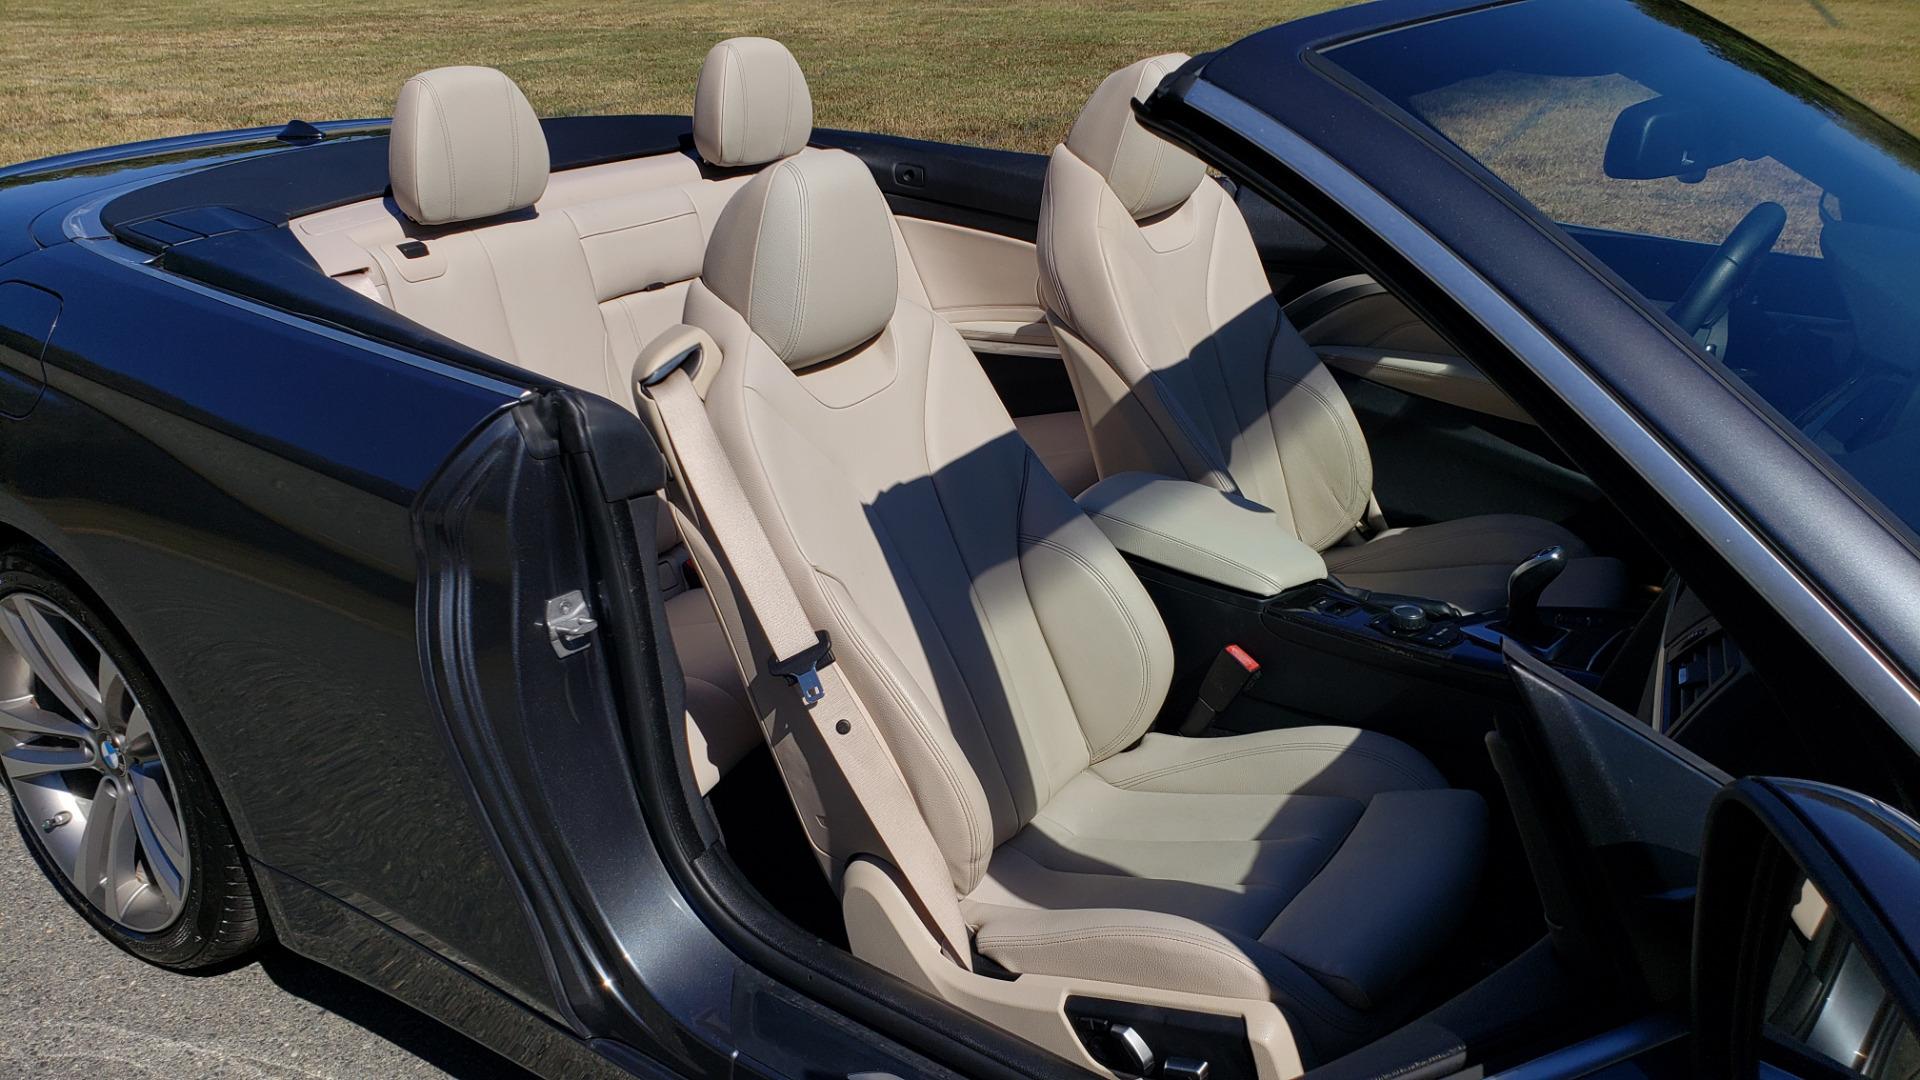 Used 2016 BMW 4 Series 428i / PREMIUM PKG / DRVR ASST / BACK-UP CAMERA for sale Sold at Formula Imports in Charlotte NC 28227 25